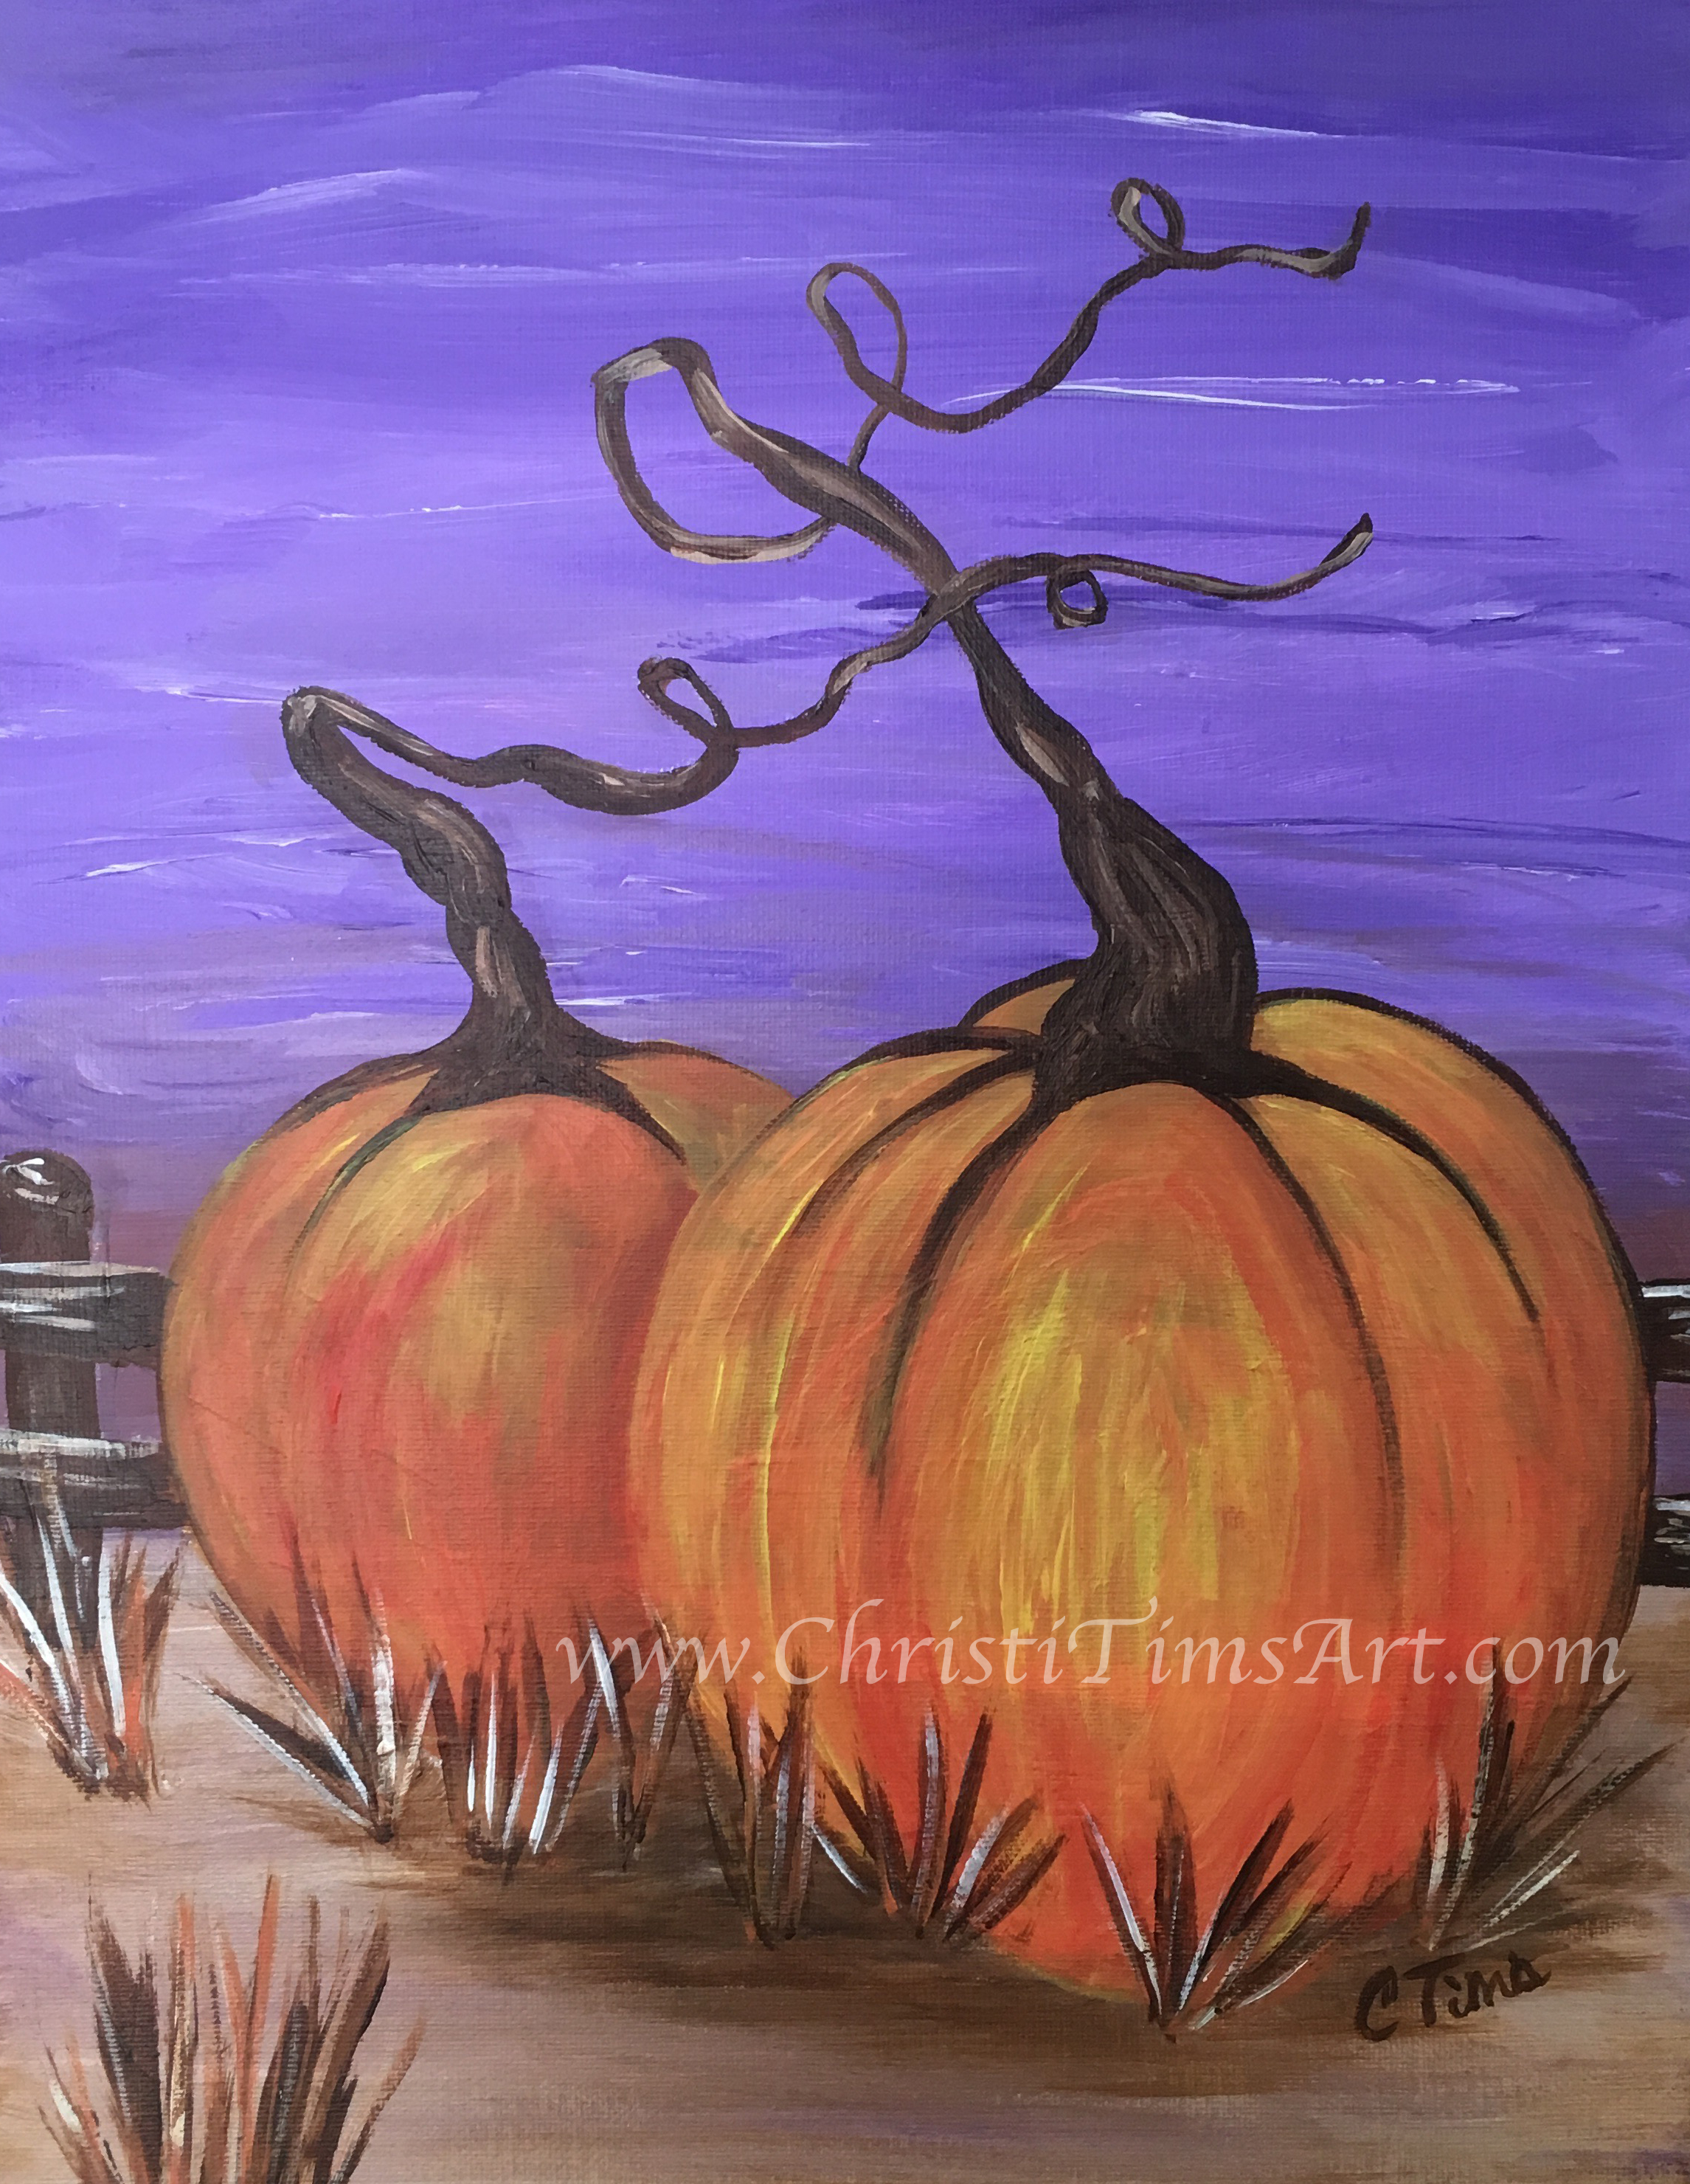 Pumpkins by Christi Tims